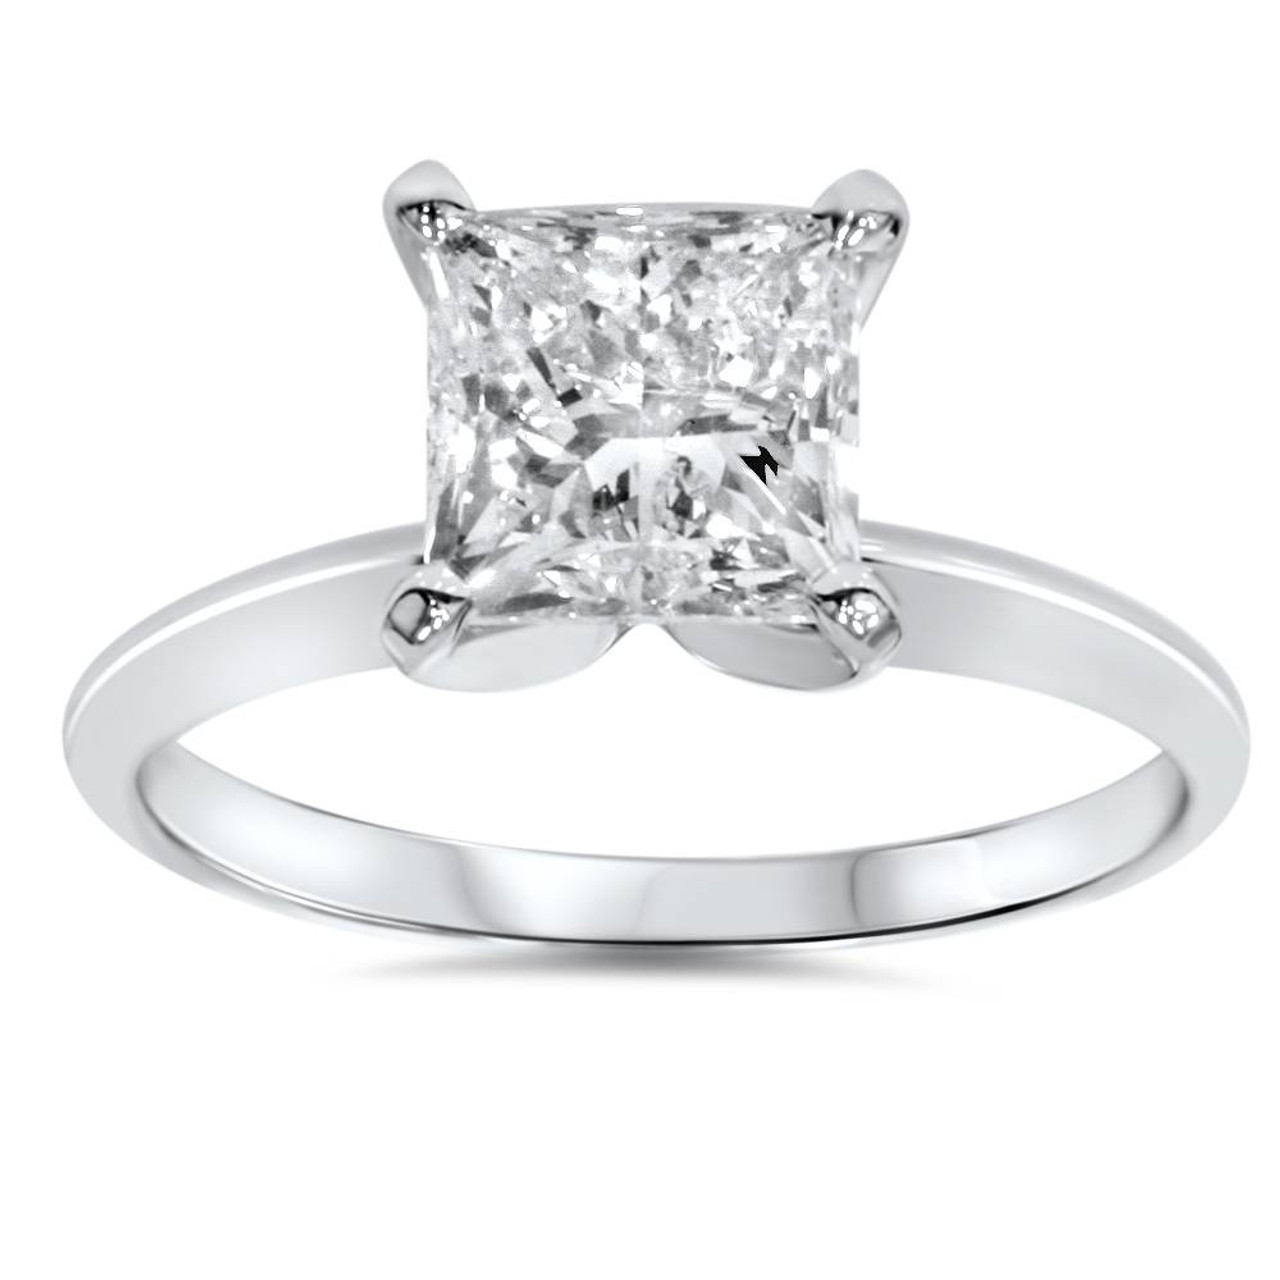 2ct Princess Cut Diamond Solitaire Engagement Ring 14k White Gold